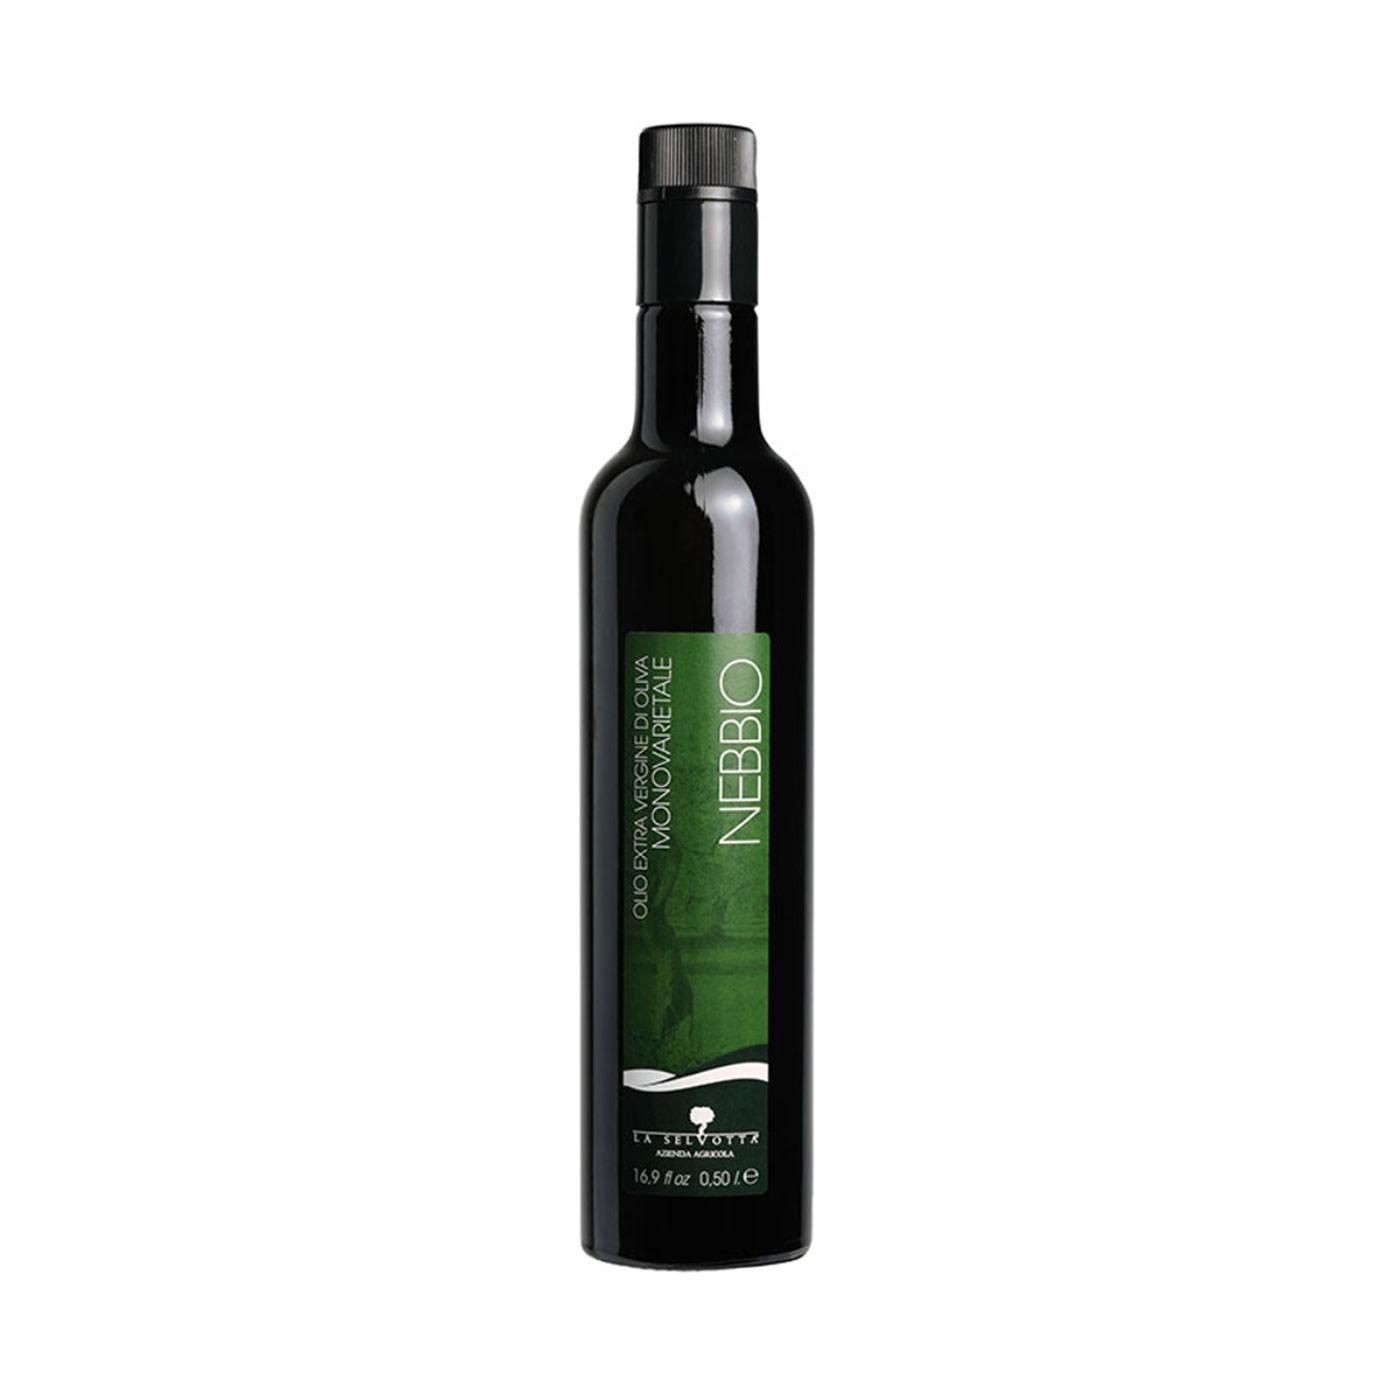 Nebbio Extra Virgin Olive Oil 16.9 oz